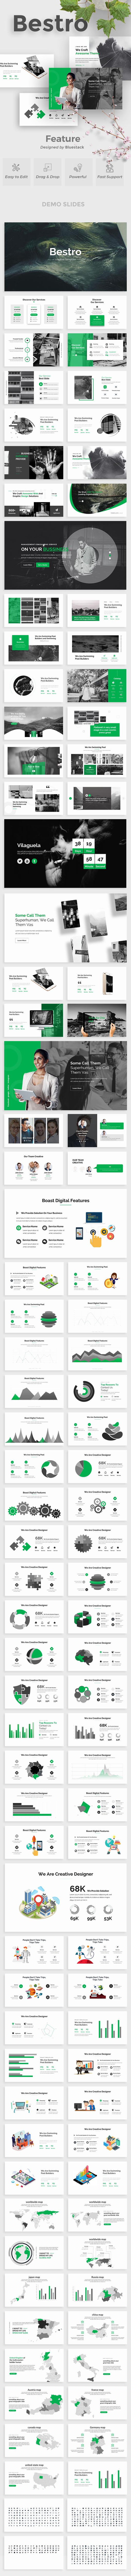 Bestro Creative Google Slide Template - Google Slides Presentation Templates